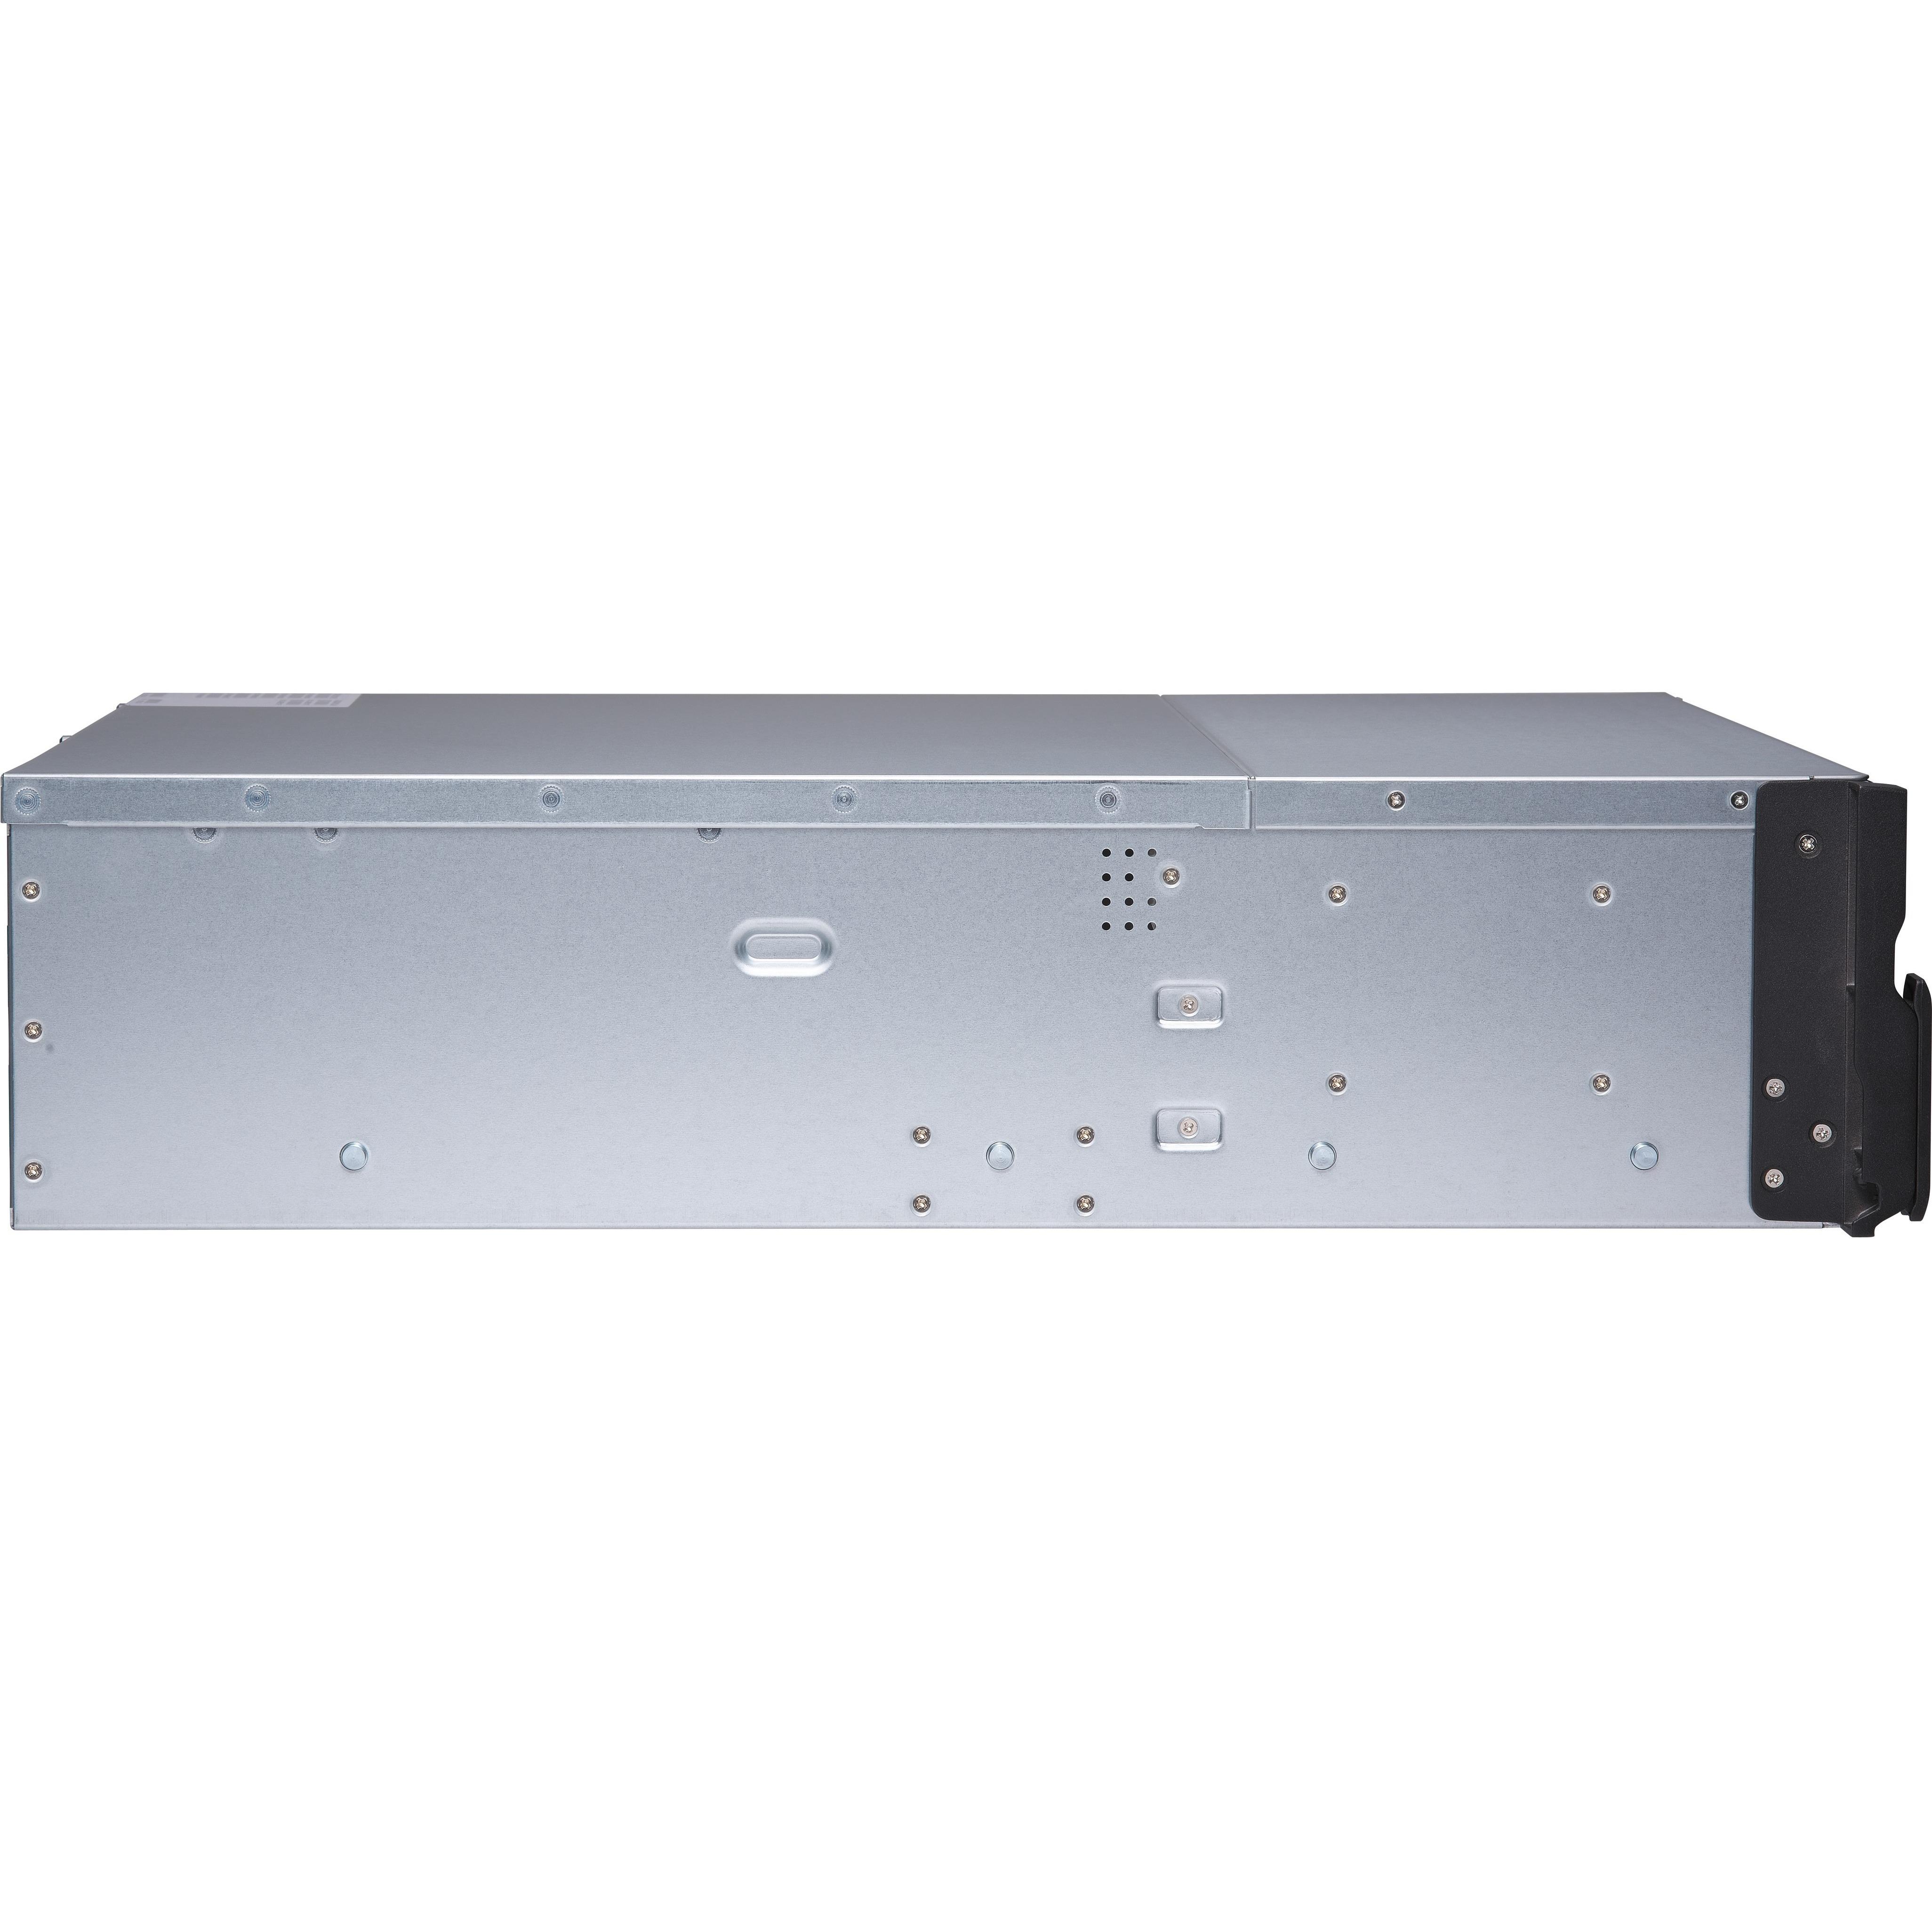 QNAP Turbo NAS TS-1673U-RP 16 x Total Bays SAN/NAS Storage System - 3U - Rack-mountable